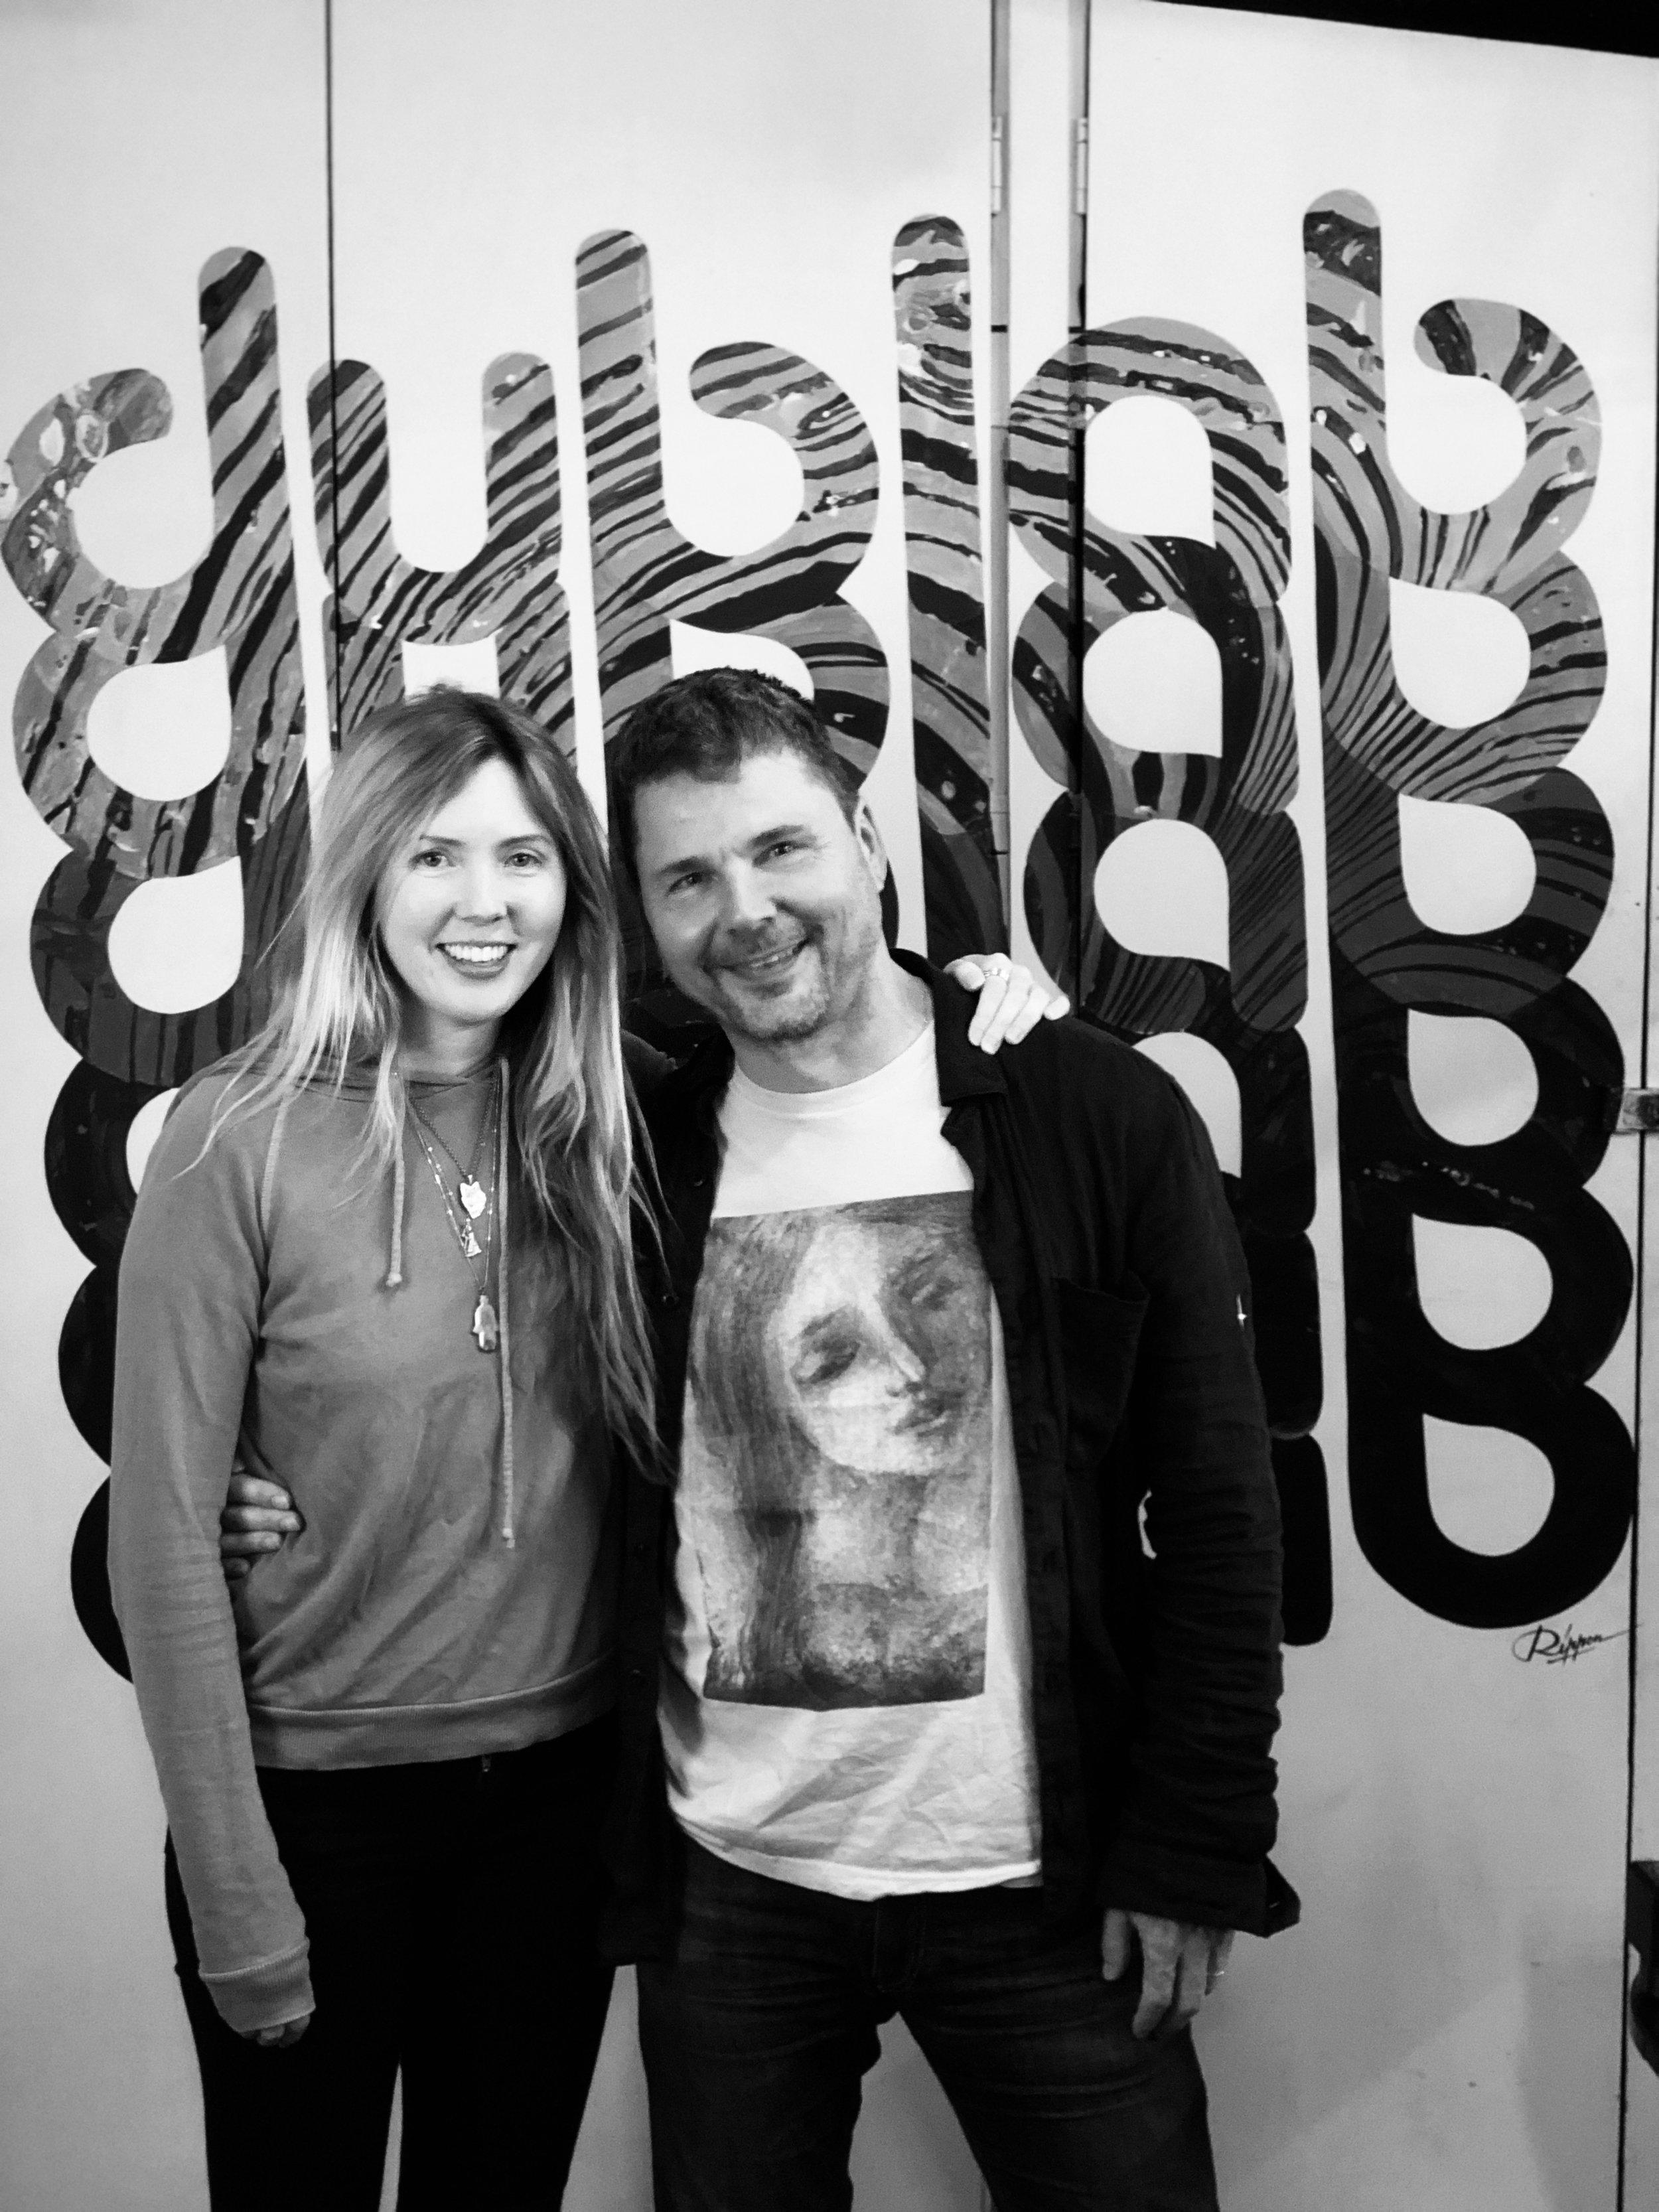 dublab radio hosts Beatie Wolfe's show orange juice for the ears. ep04 with Walter Werzowa